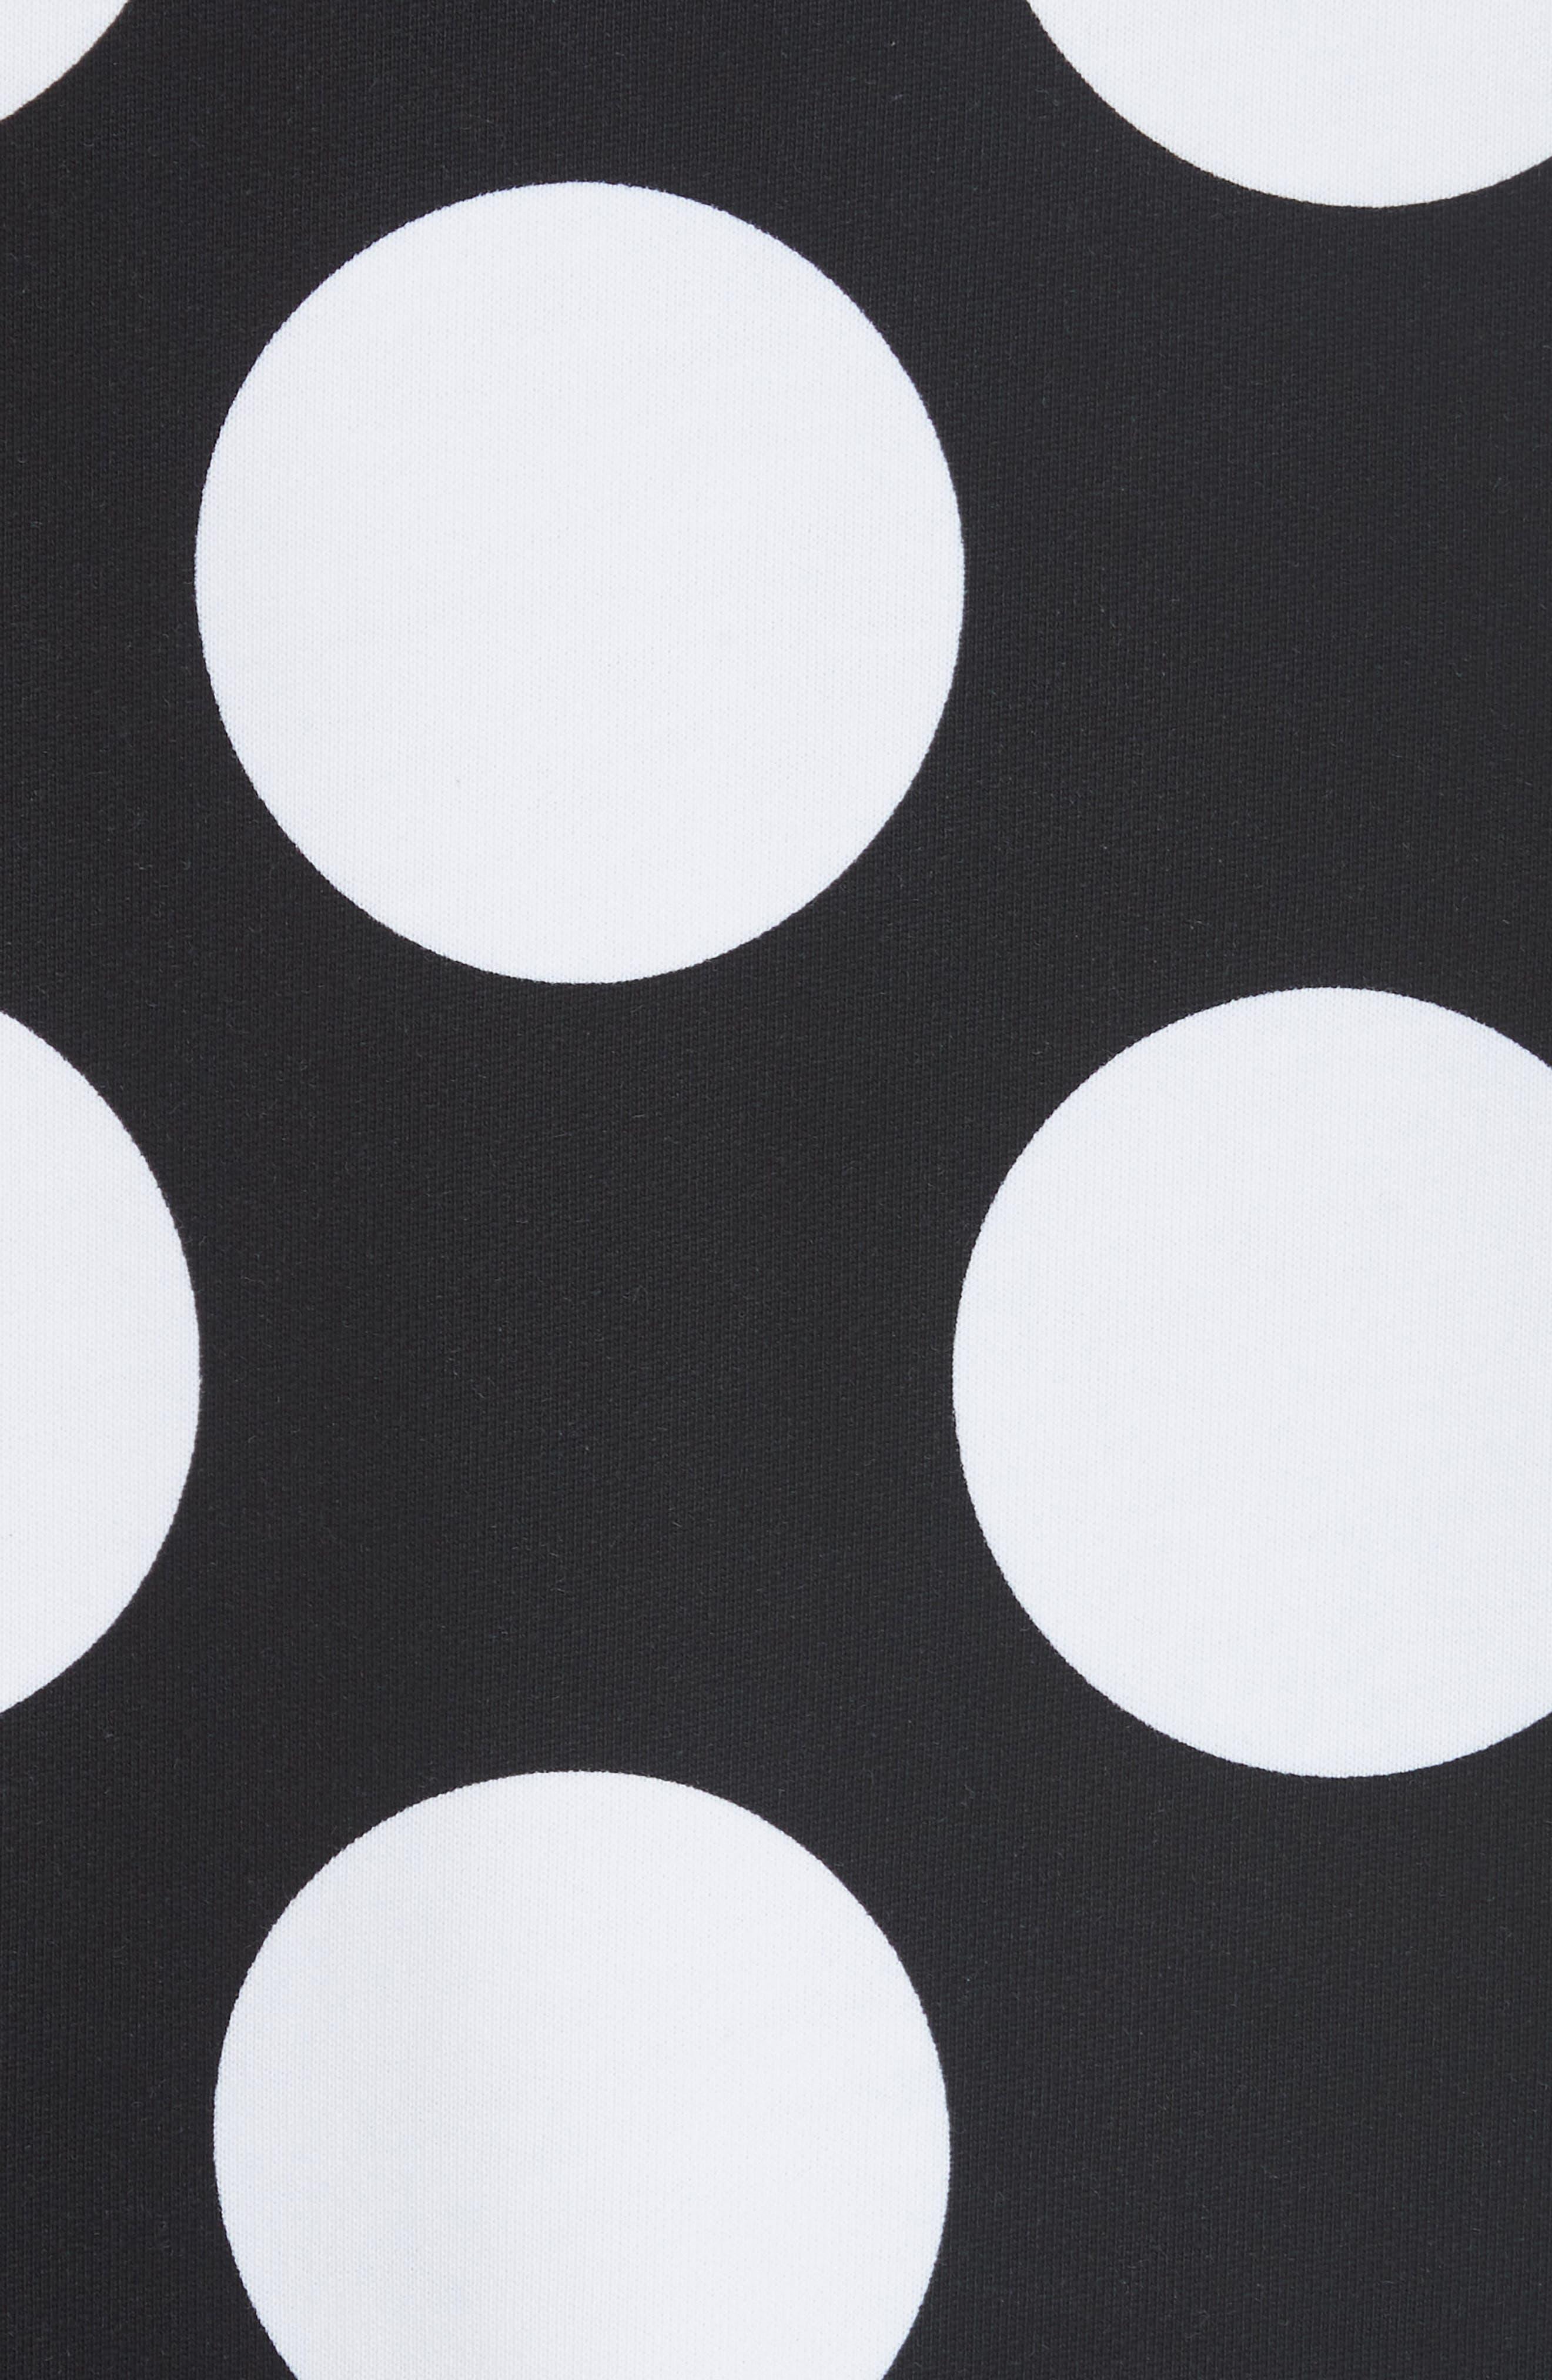 Polka Dot Print Sweatshirt,                             Alternate thumbnail 5, color,                             BLACK/ WHITE